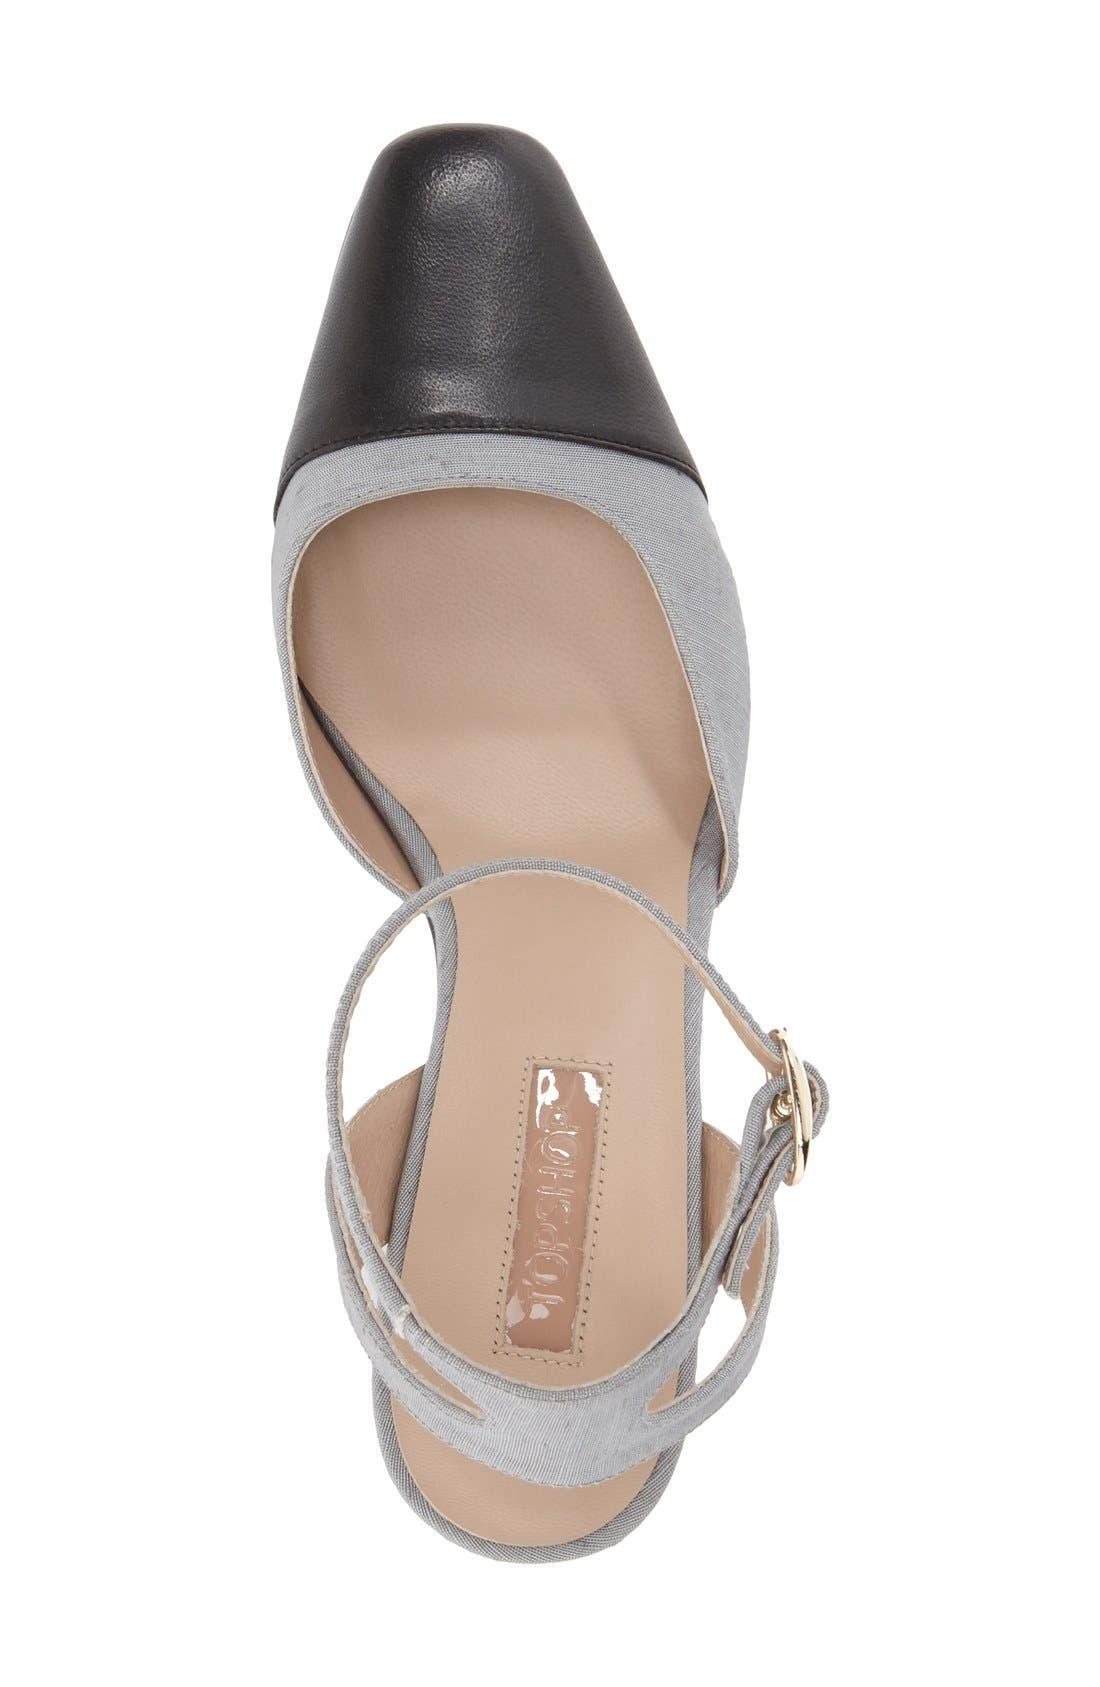 Alternate Image 3  - Topshop 'Jewel' Cap Toe Block Heel Pump (Women)